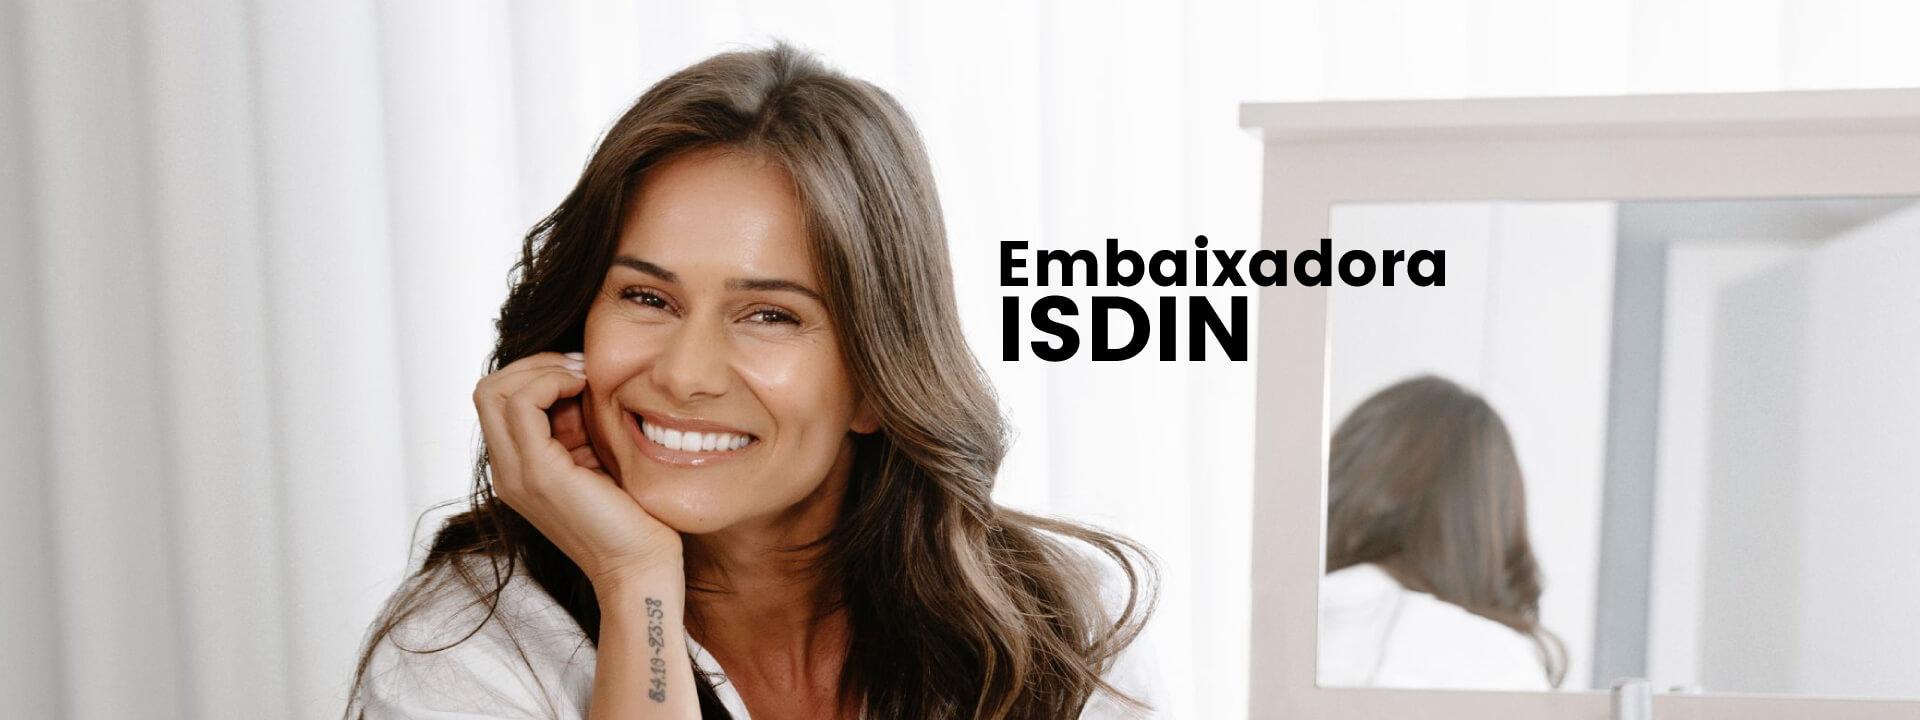 claudia vieira actriz é a nova embaixadora ISDIN Portugal